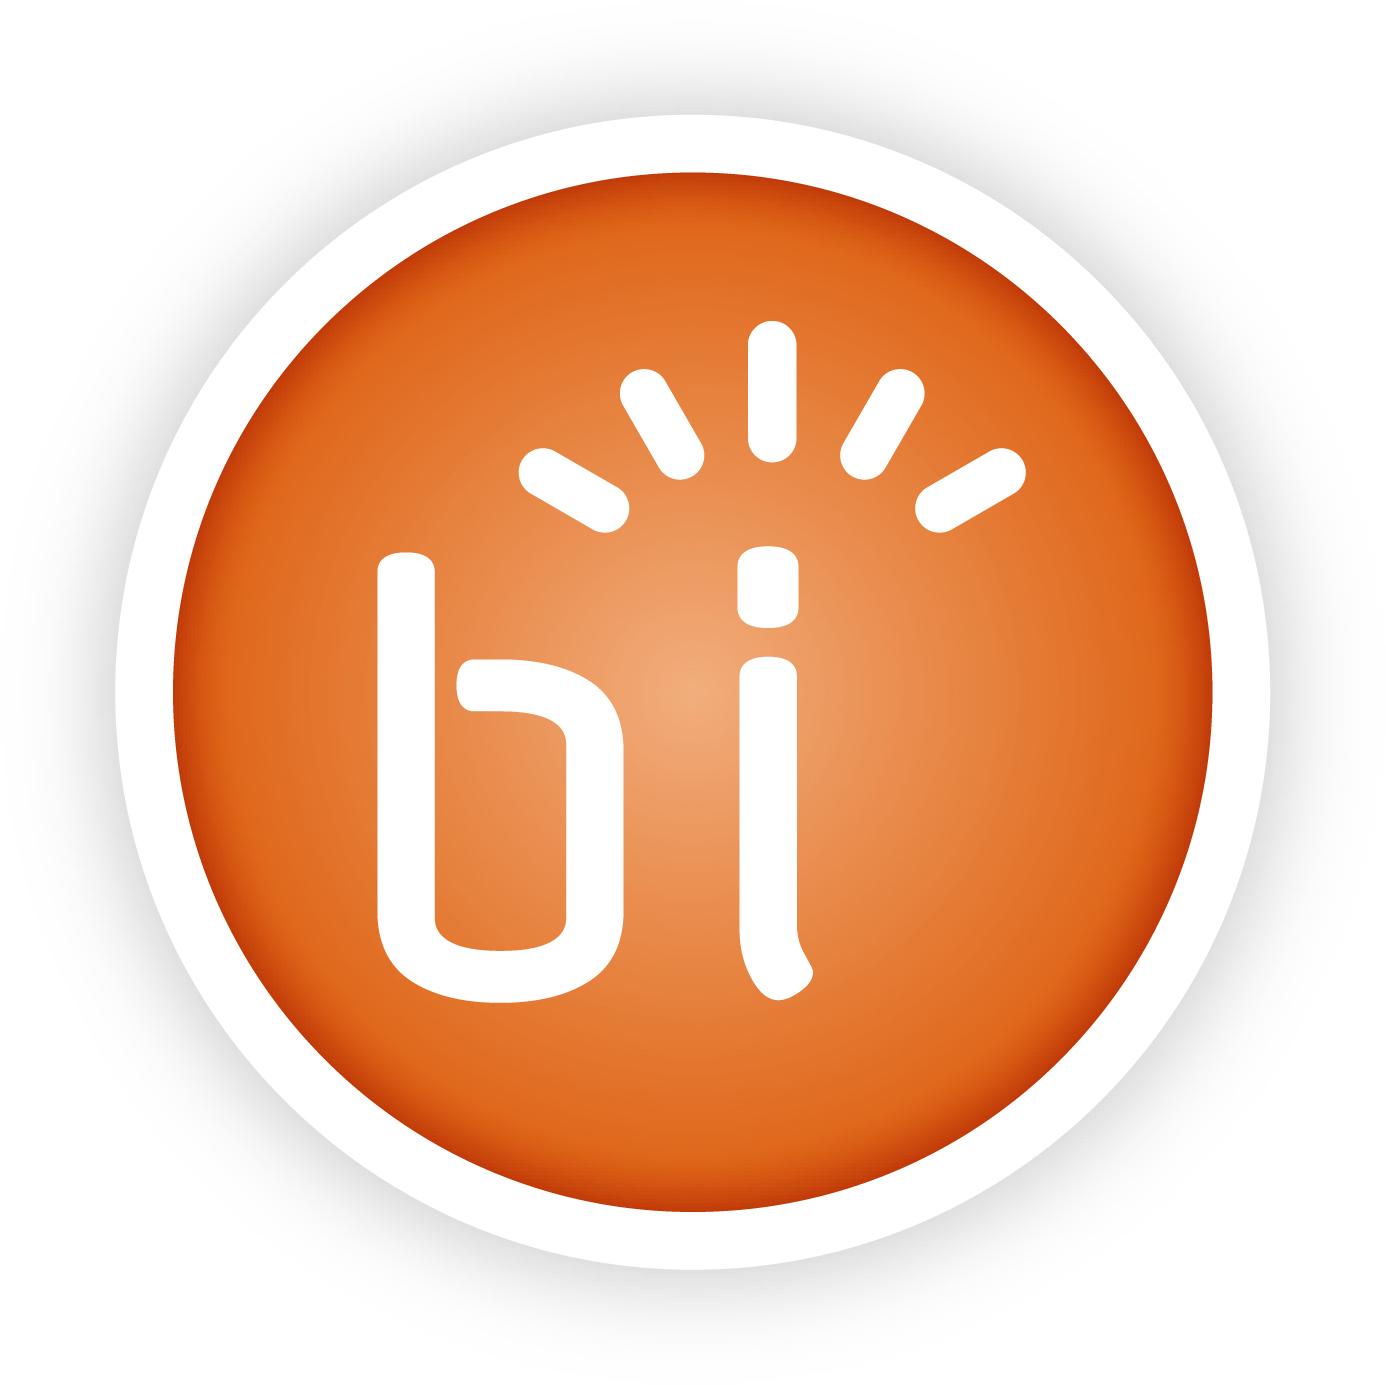 8.0 BI brand insights icon.jpg